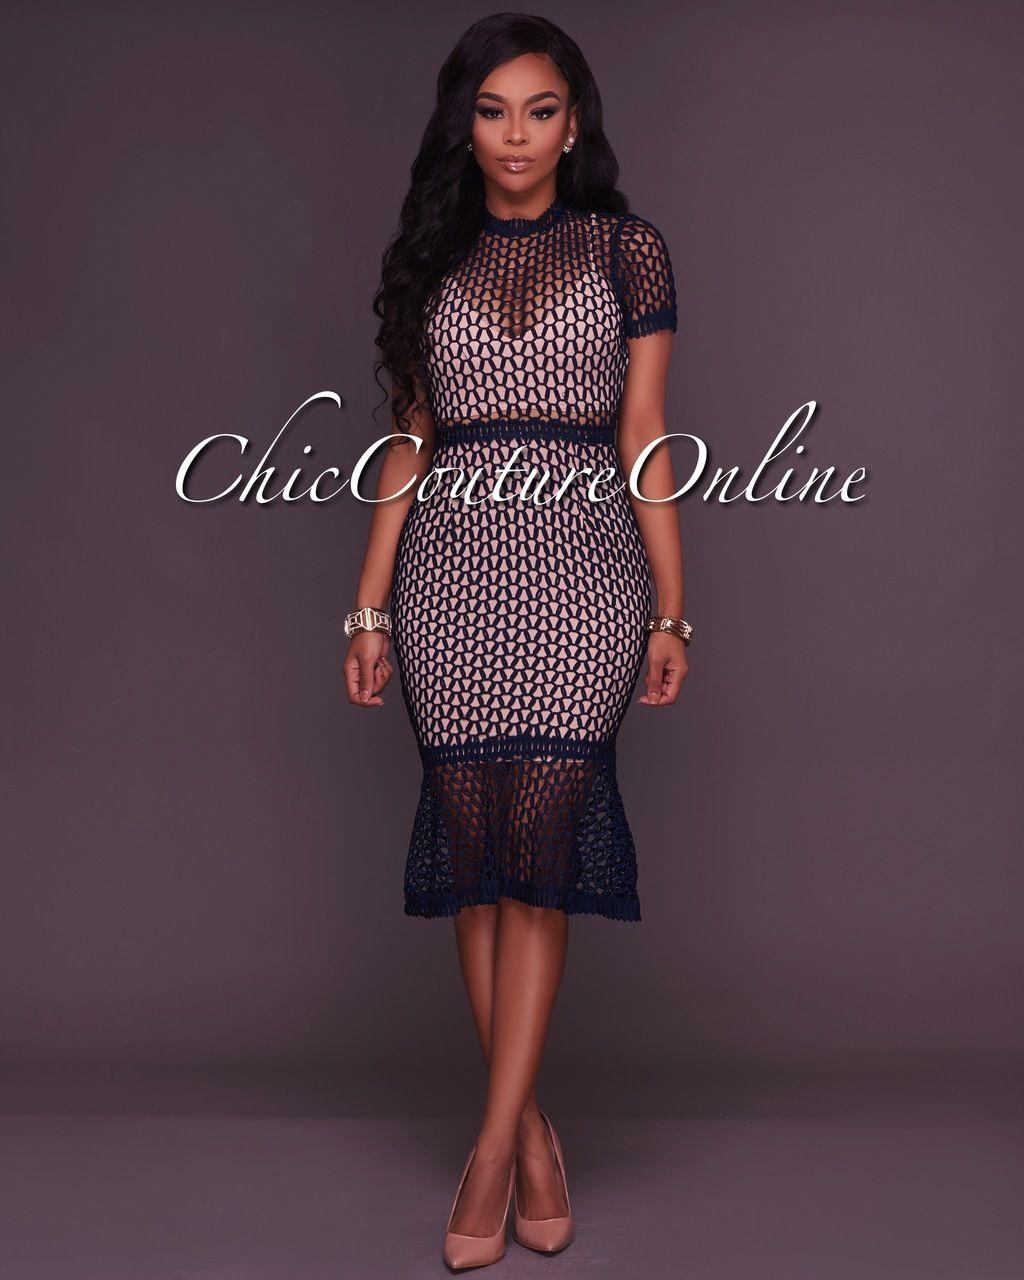 4fe1e0419ce54 Chic Couture Online - Rebekah Navy-Blue Crochet Midi Dress, $70.00 (http: